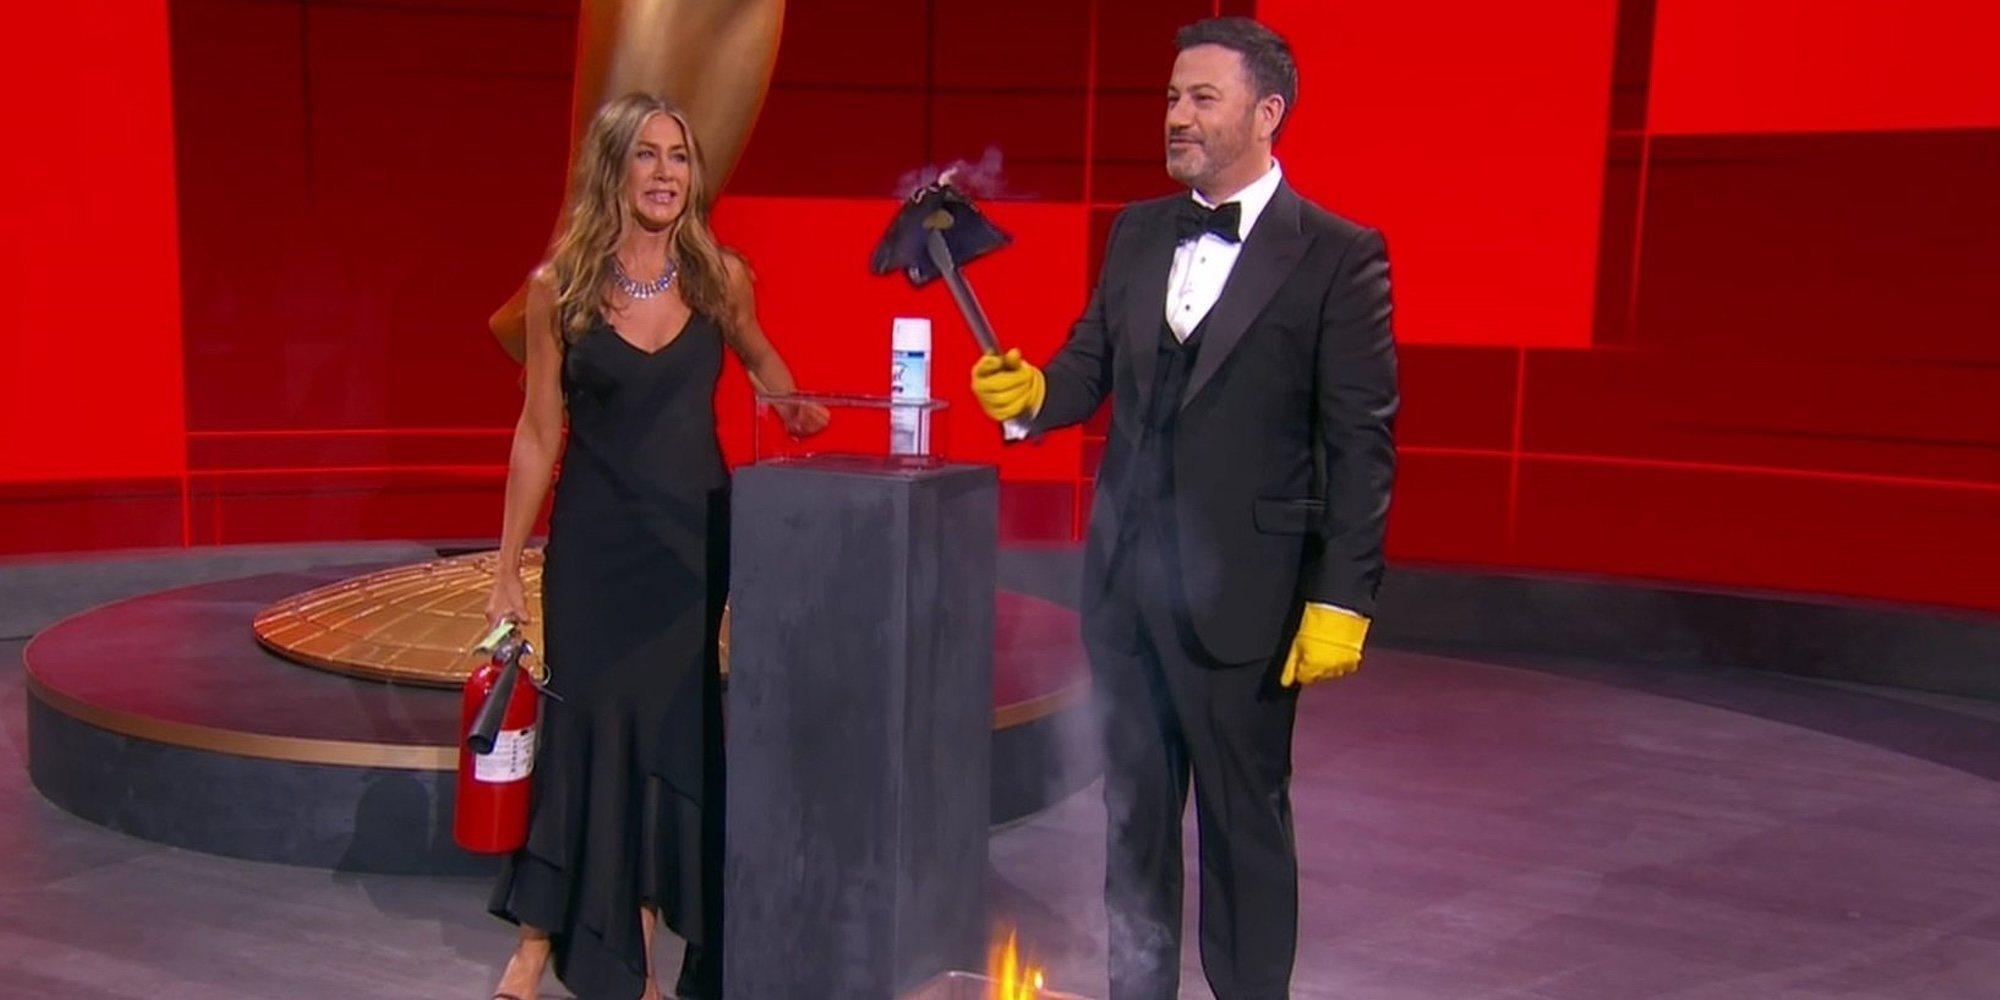 Así han sido los Emmy 2020 telemáticos: del incendio de Jennifer Aniston y Jimmy Kimmel al PCR de Jason Sudeikis